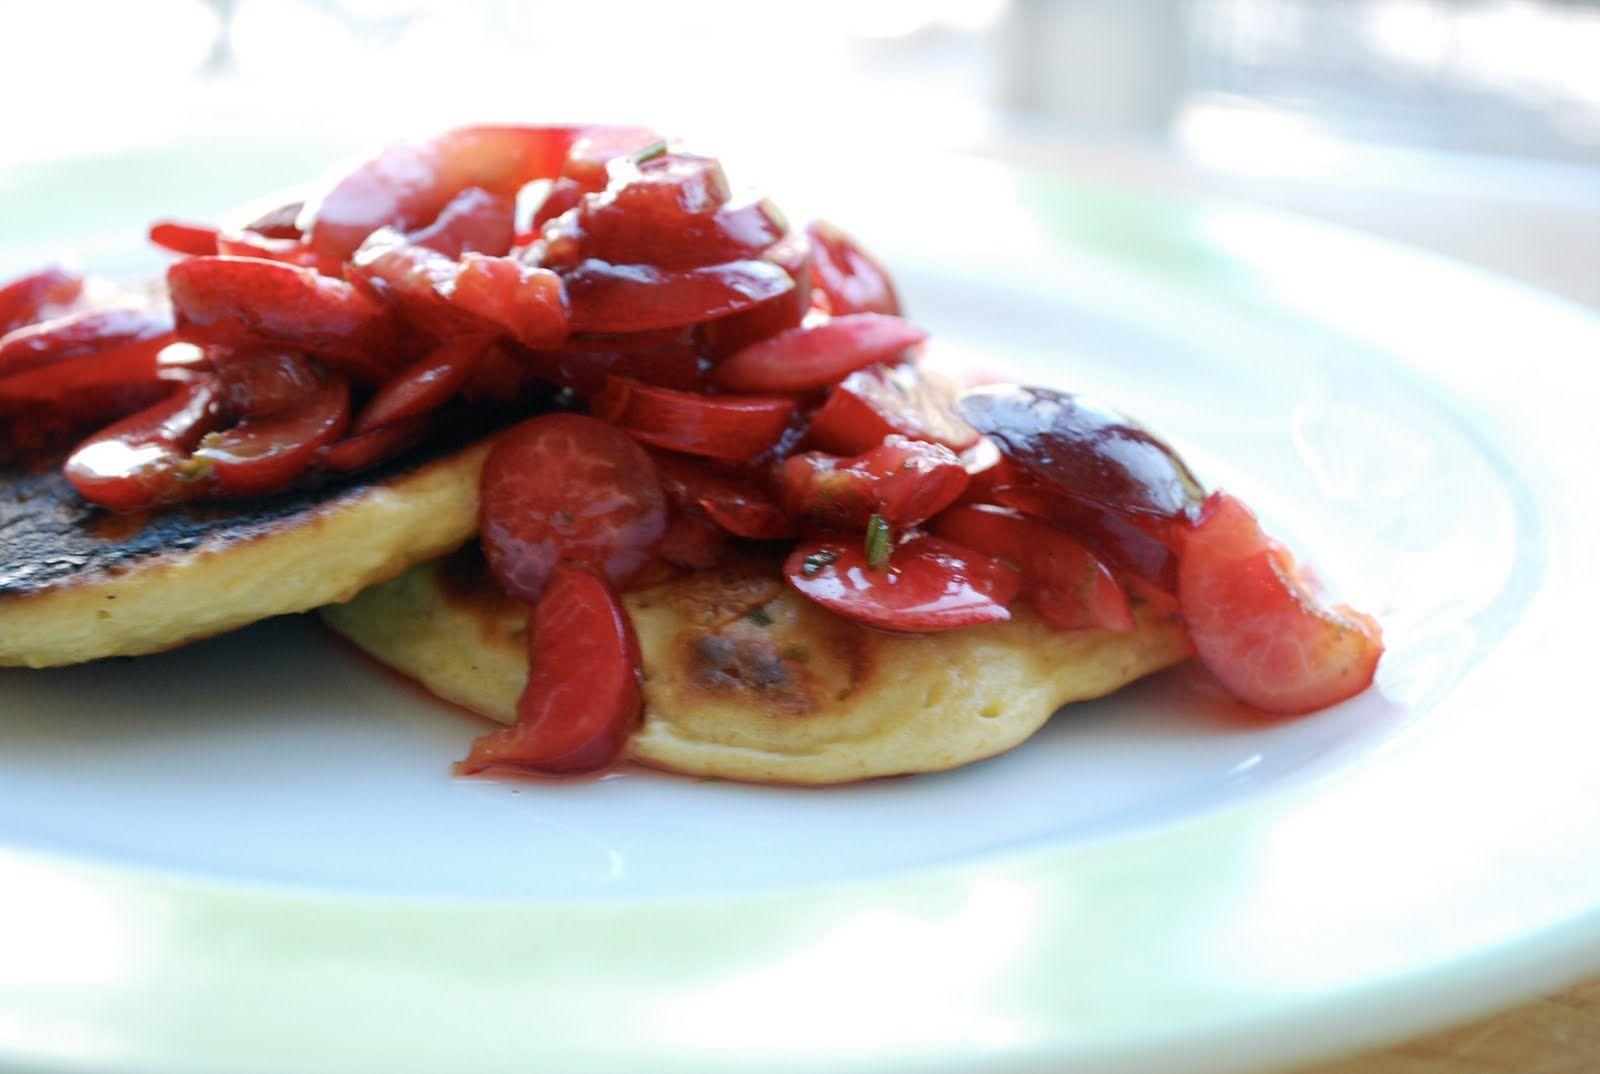 rosemary polenta pancakes with sliced cherries and lime: polenta, nondairy milk, fresh rosemary